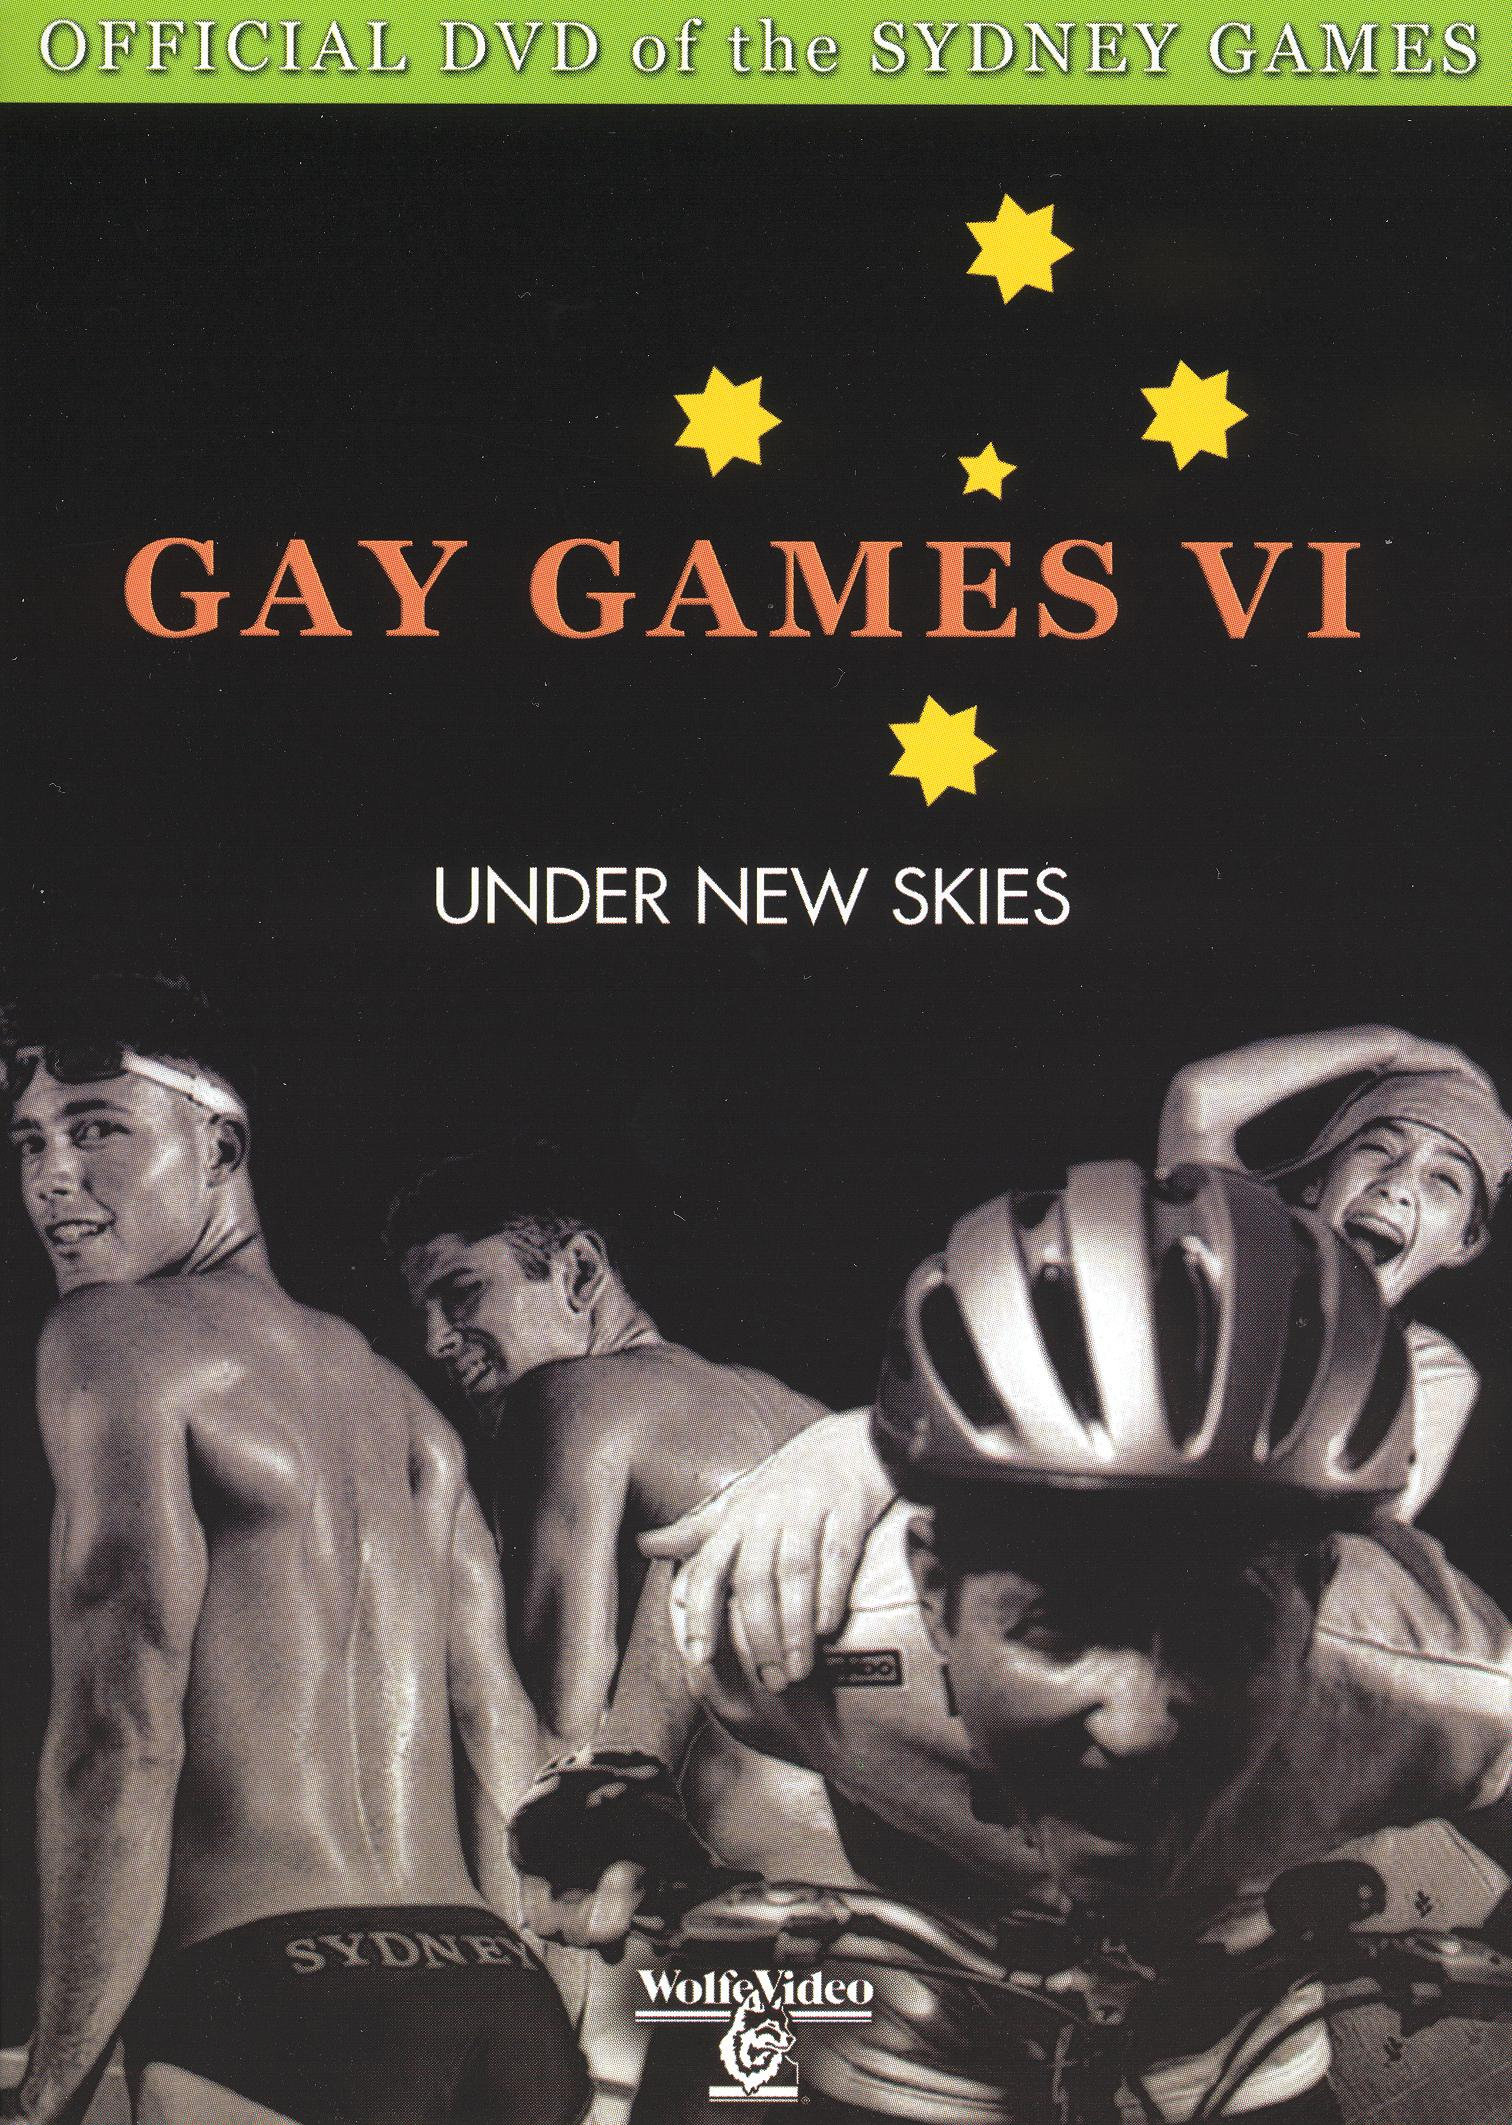 Gay Games VI: Sydney 2002 - Under New Skies